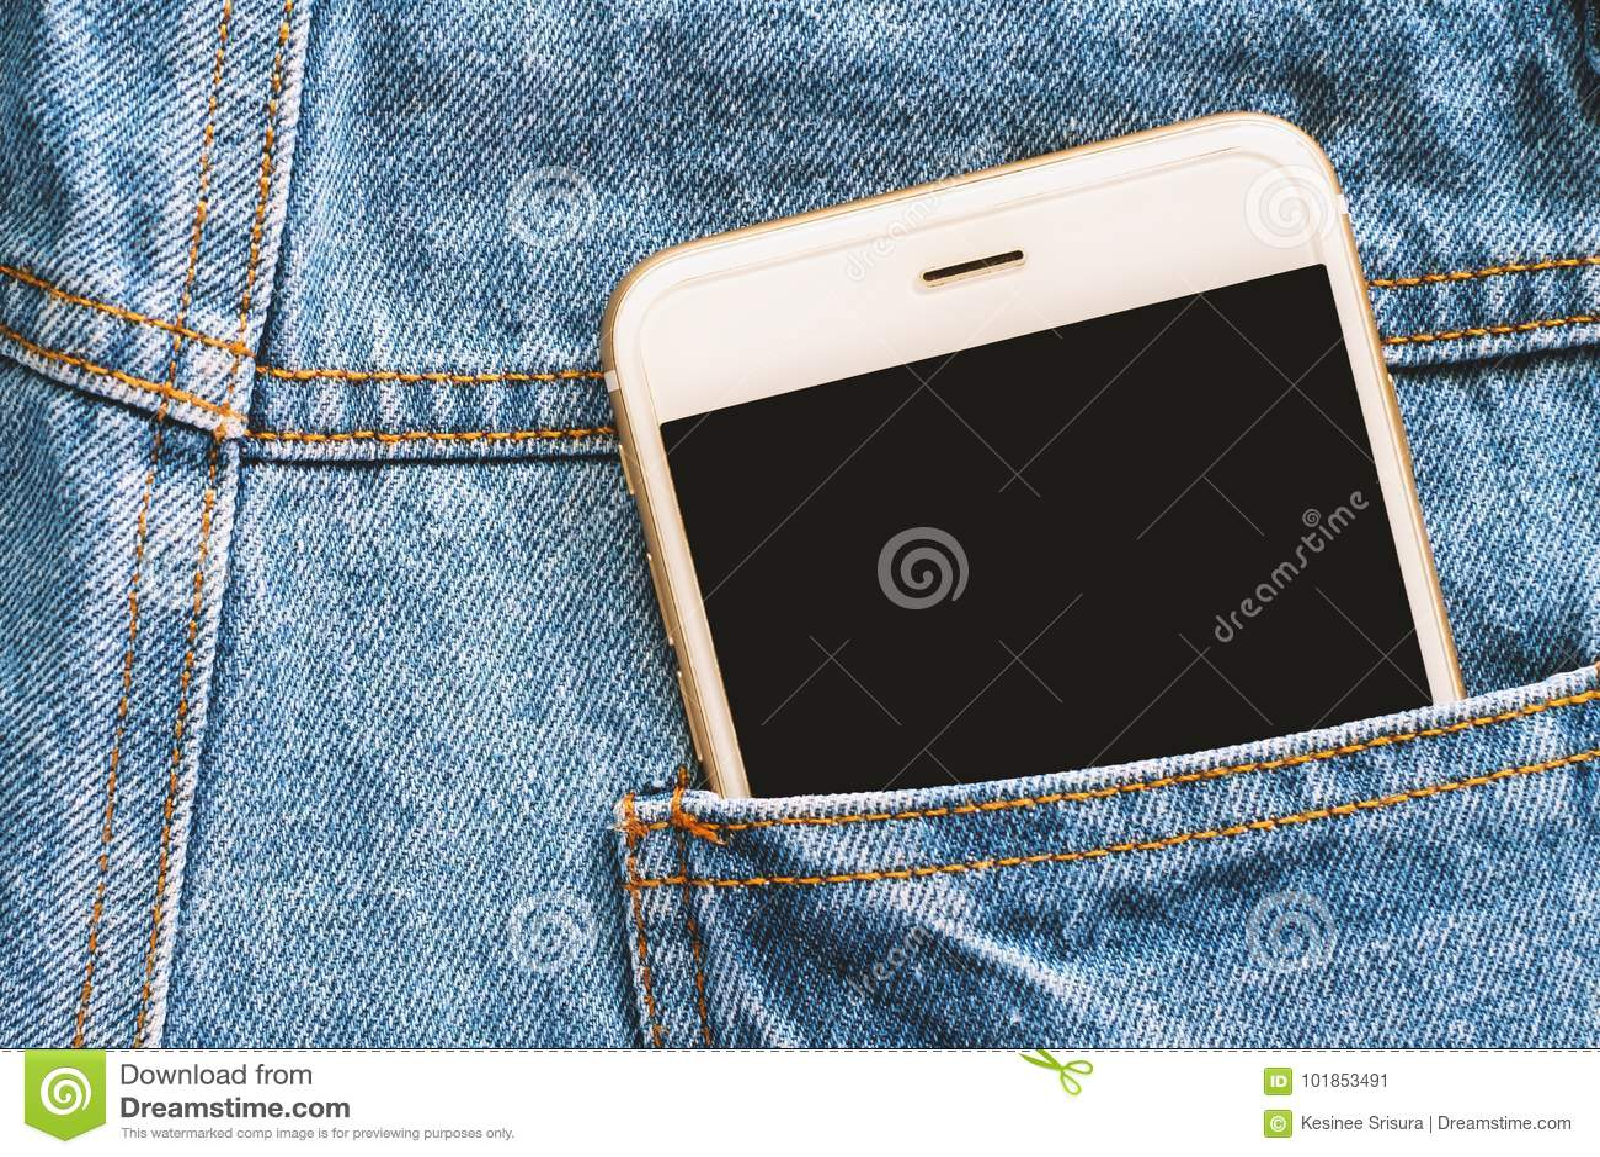 Smartphone en la parte de atrás de la mezclilla del azul del bolsillo